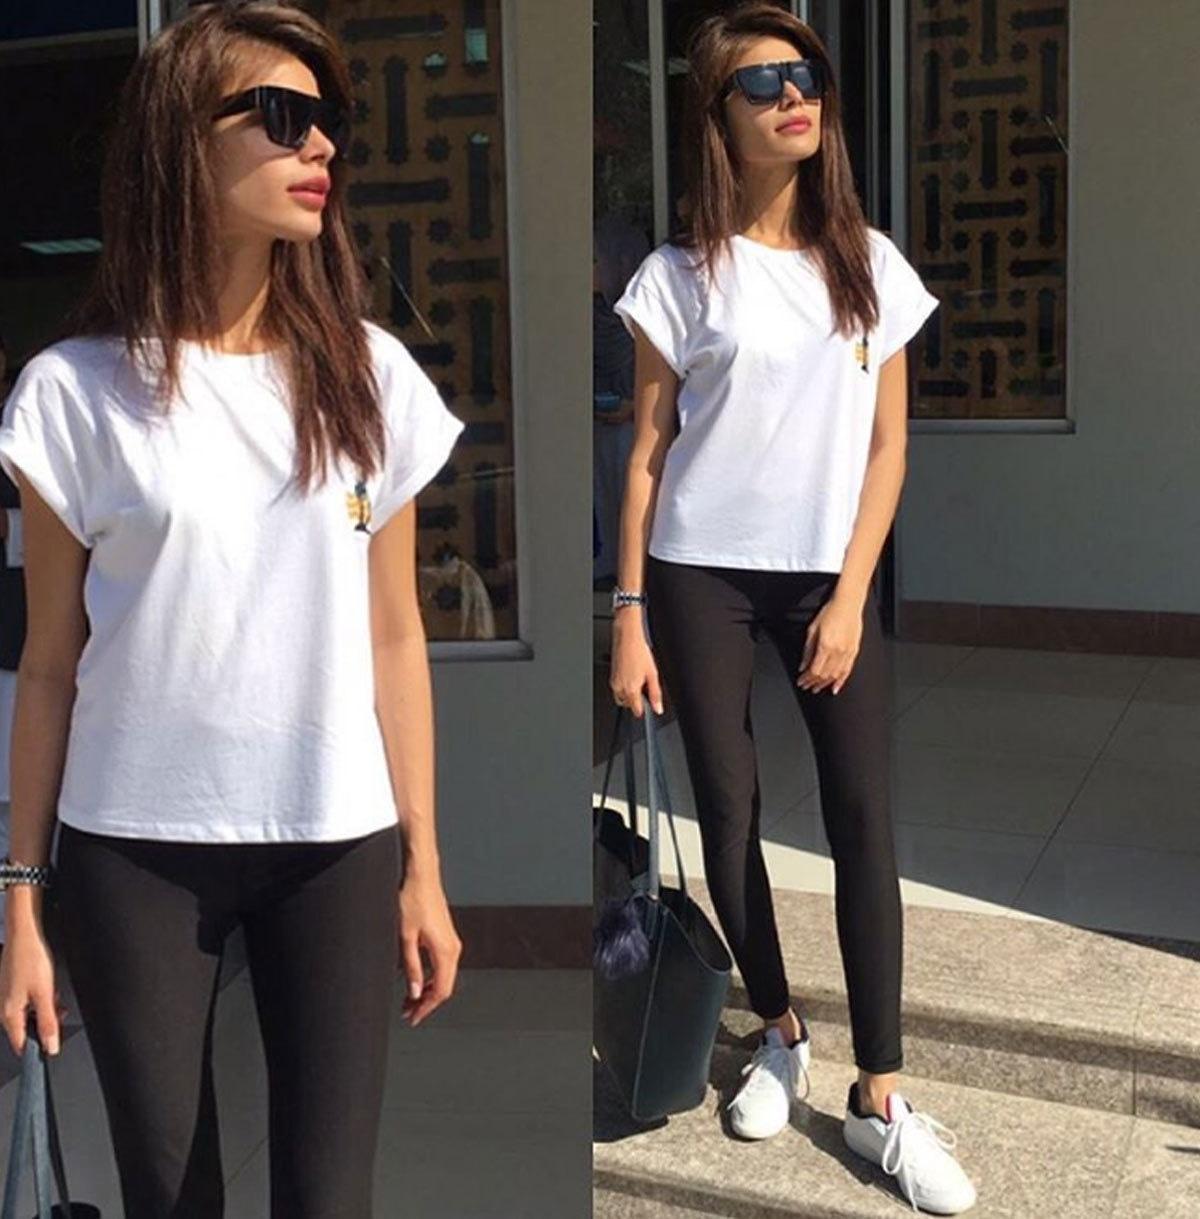 Sadaf Kanwal in white sneaks and shirt, ready to go anywhere